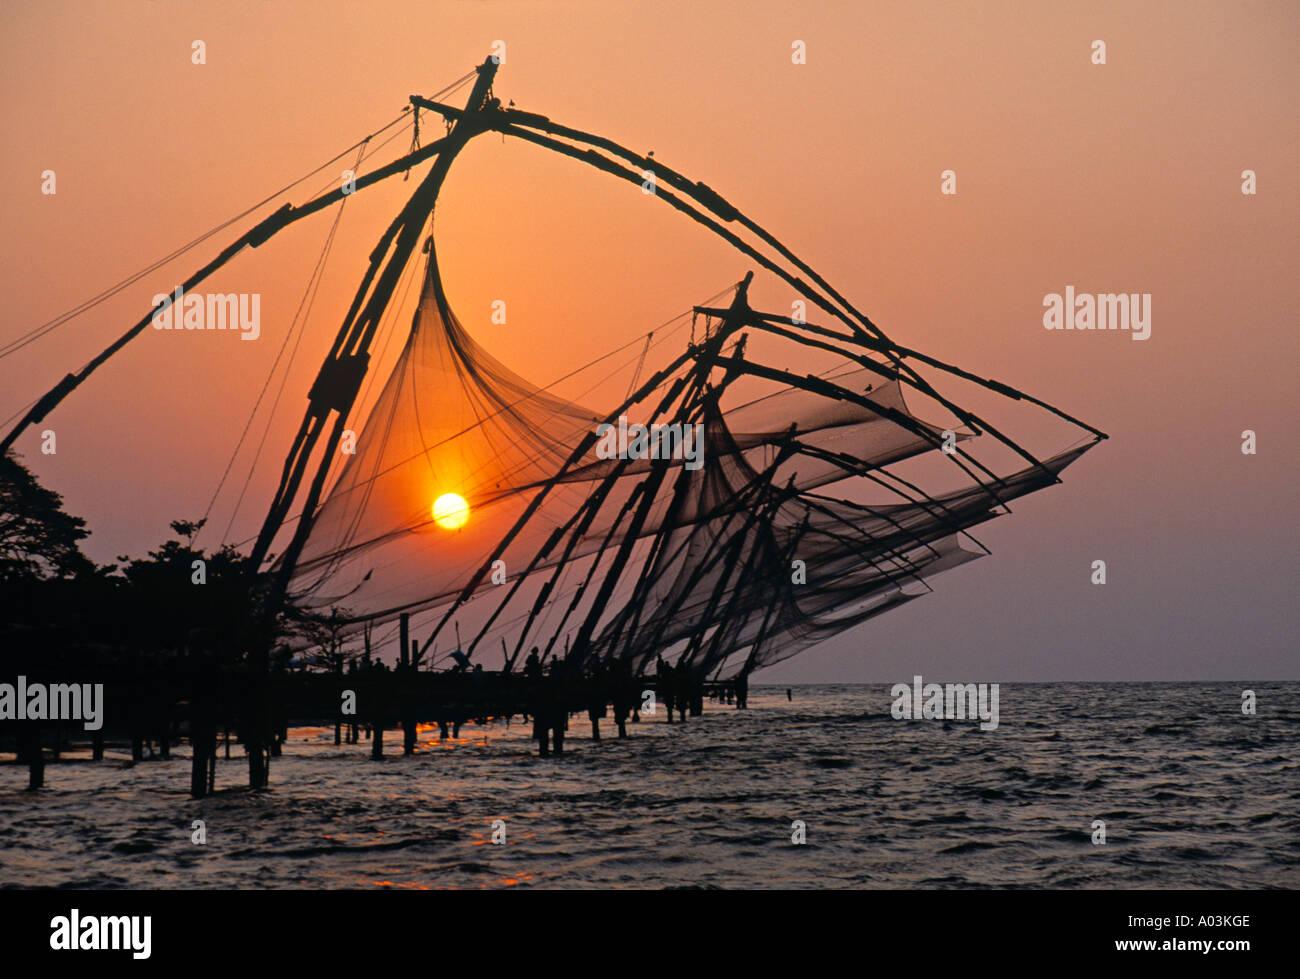 Filets de pêche chinois, Cochin, Kerala, Inde Photo Stock